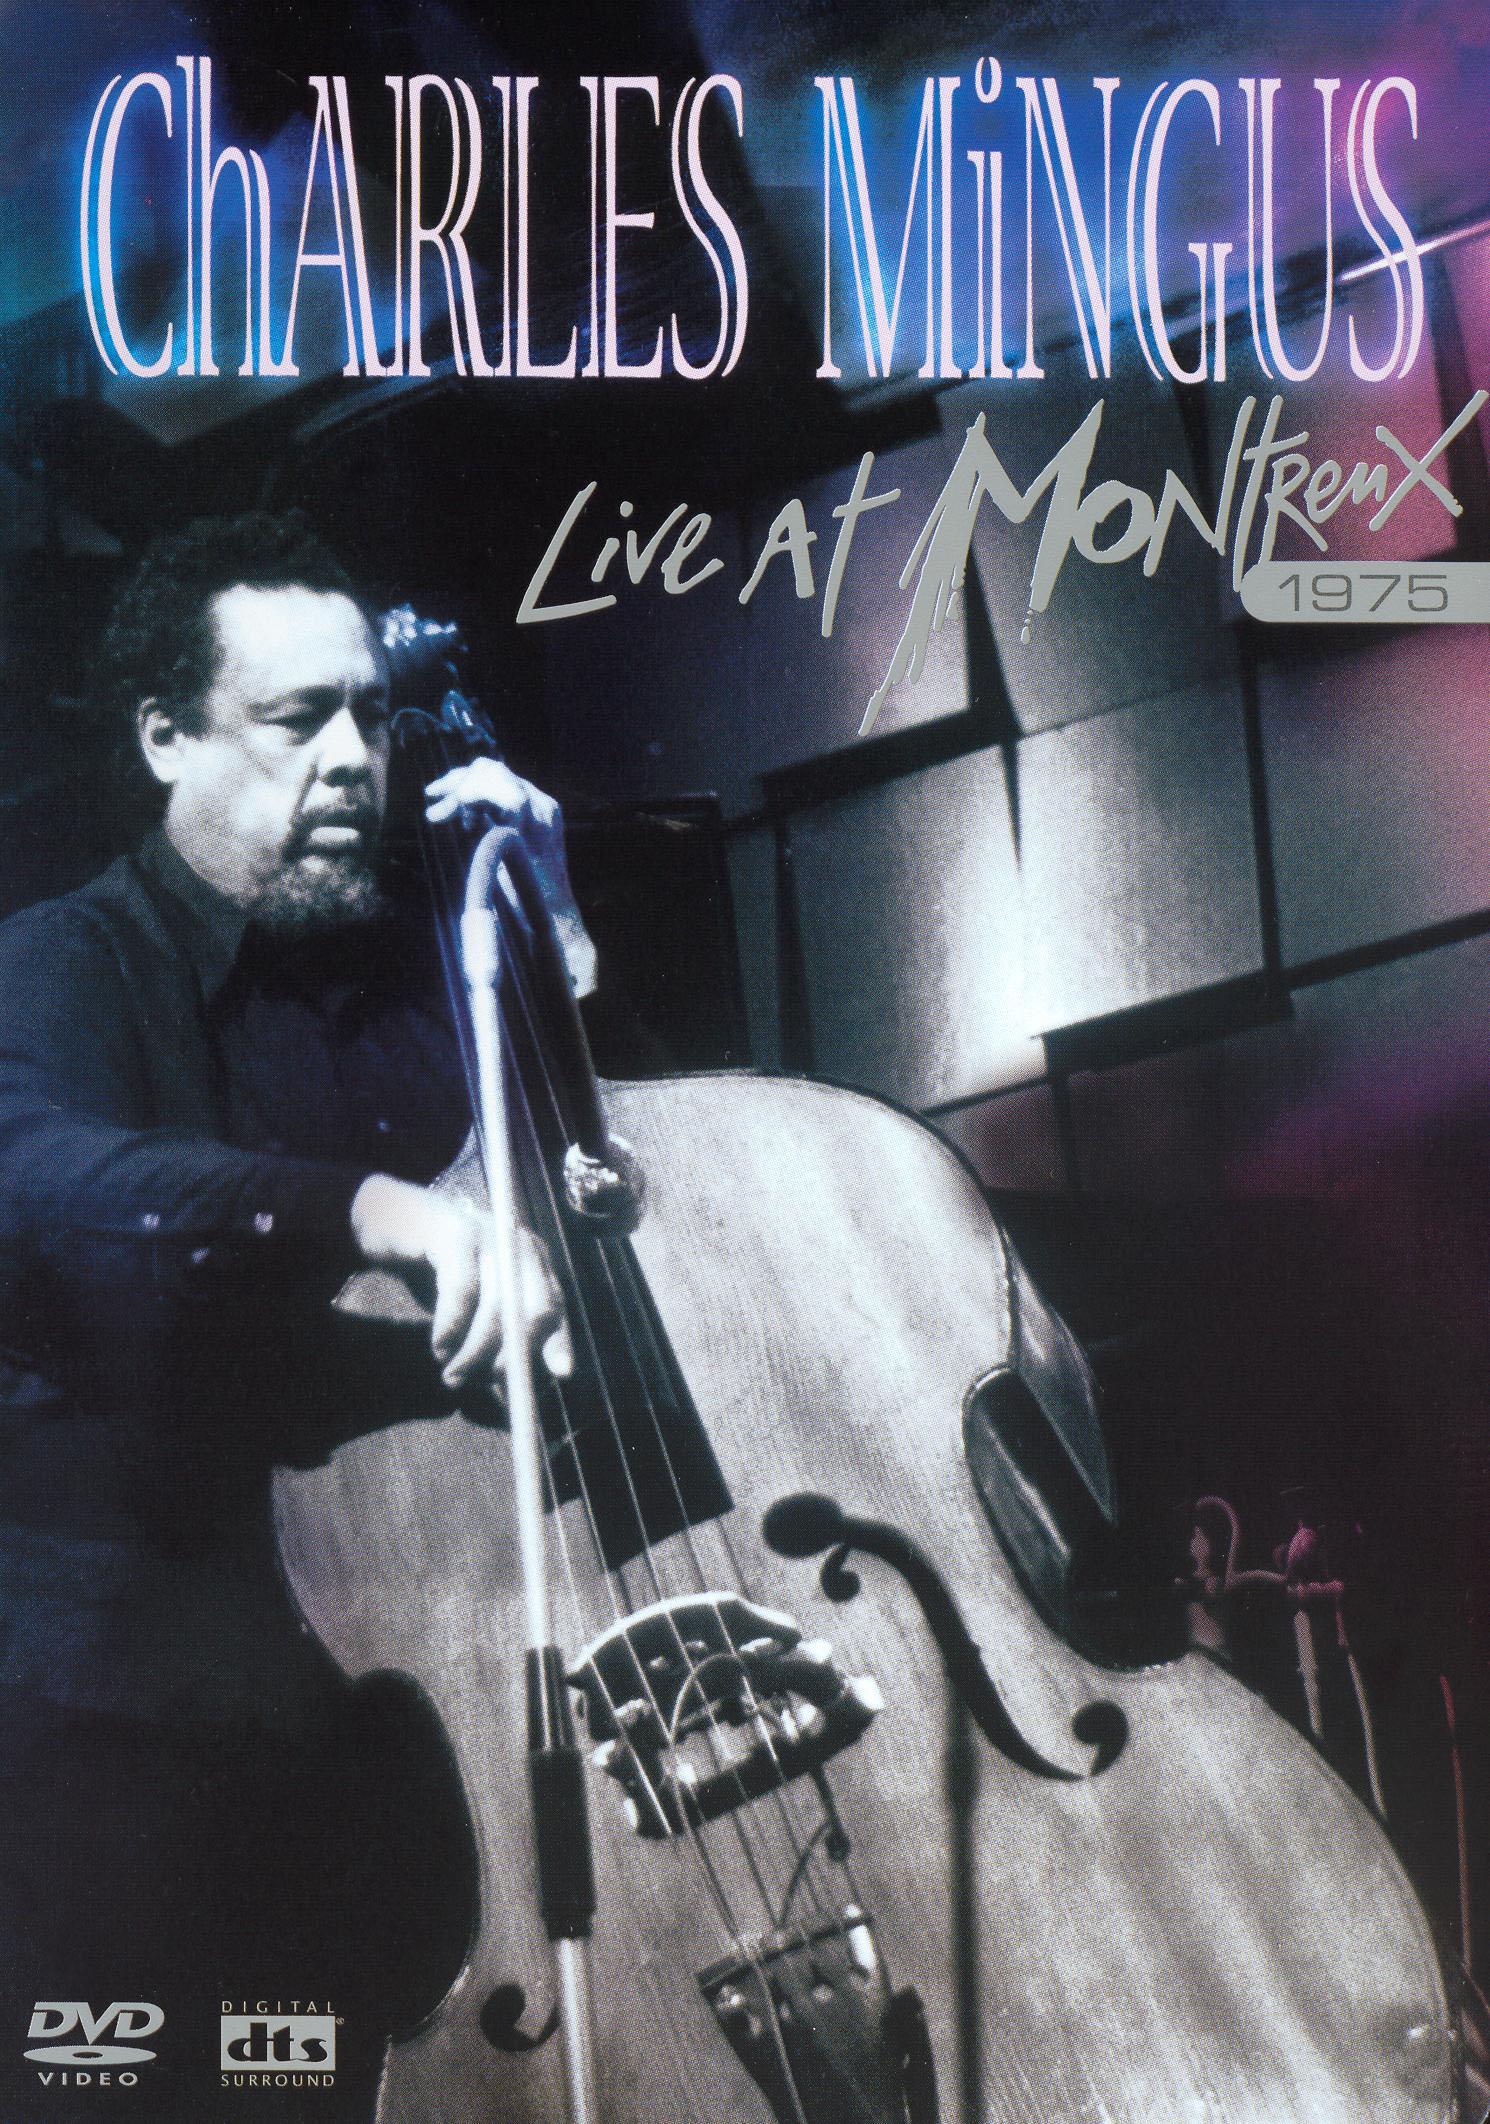 Charles Mingus: Live at Montreux 1975